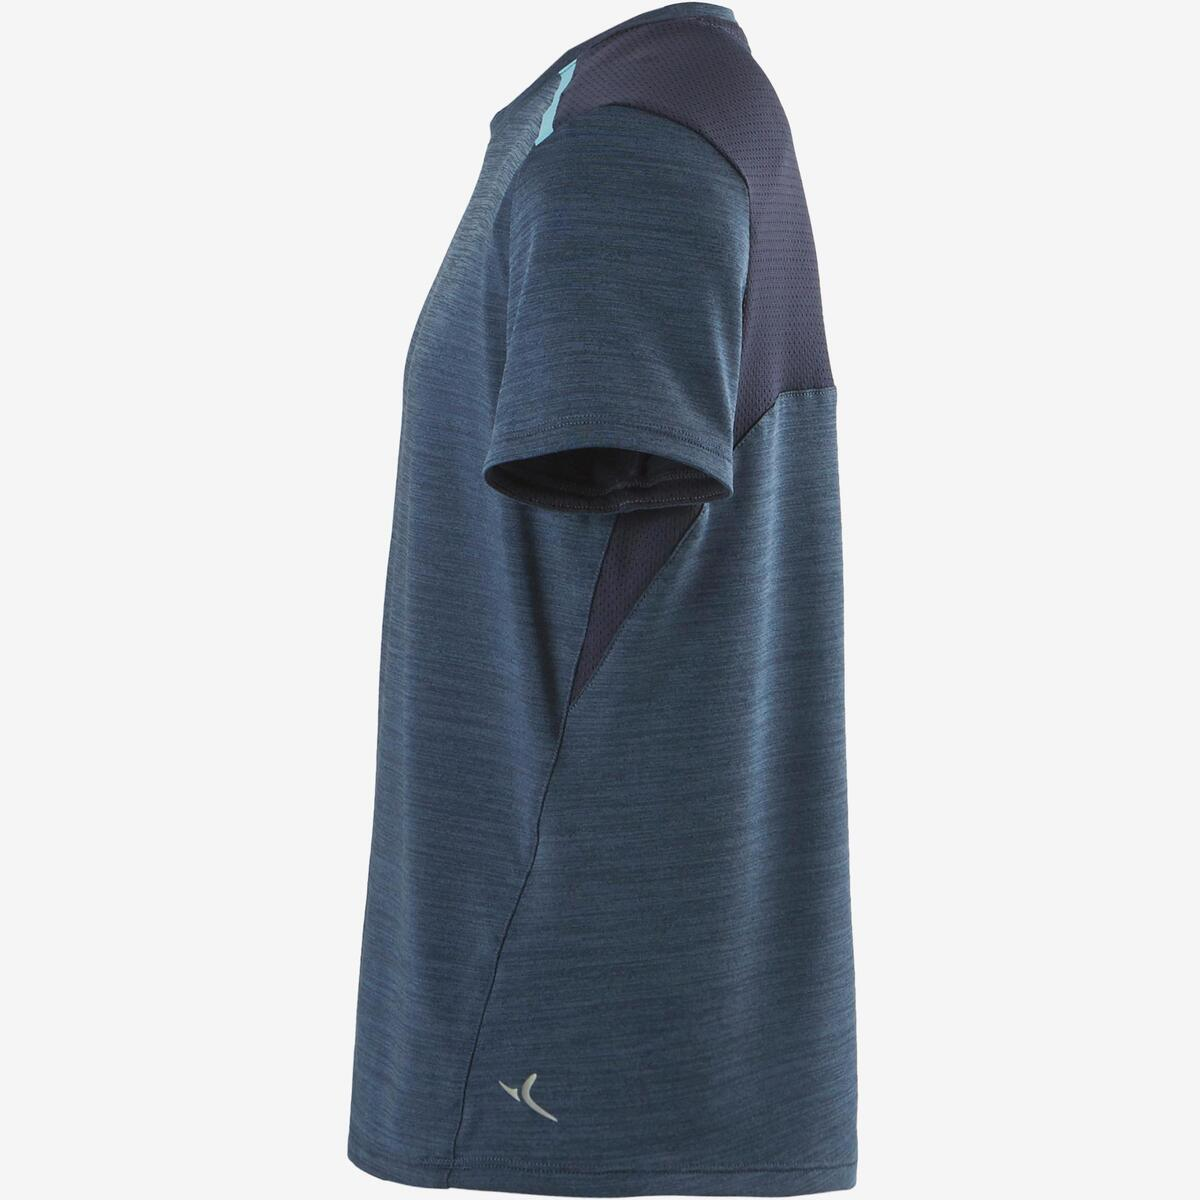 Bild 4 von T-Shirt Synthetik atmungsaktiv S500 Gym Kinder dunkelblau